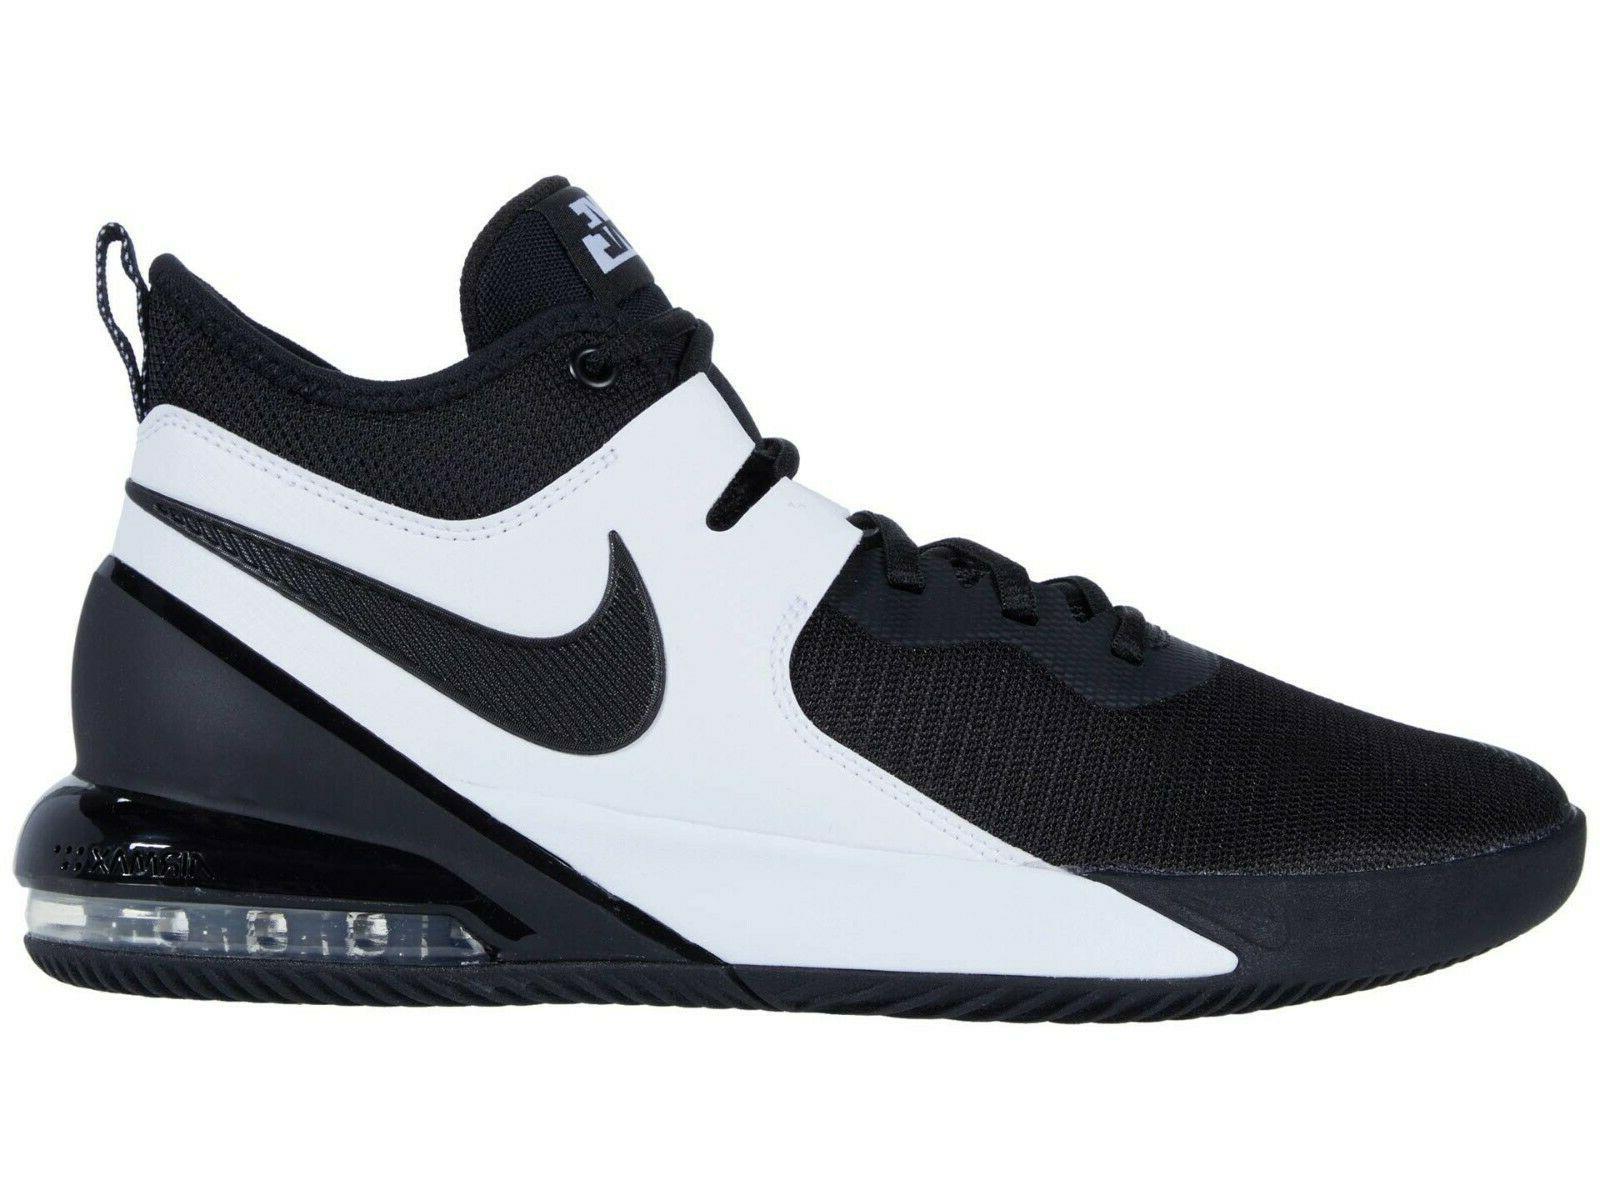 Nike AIR Mens CI1396-004 Basketball Shoes